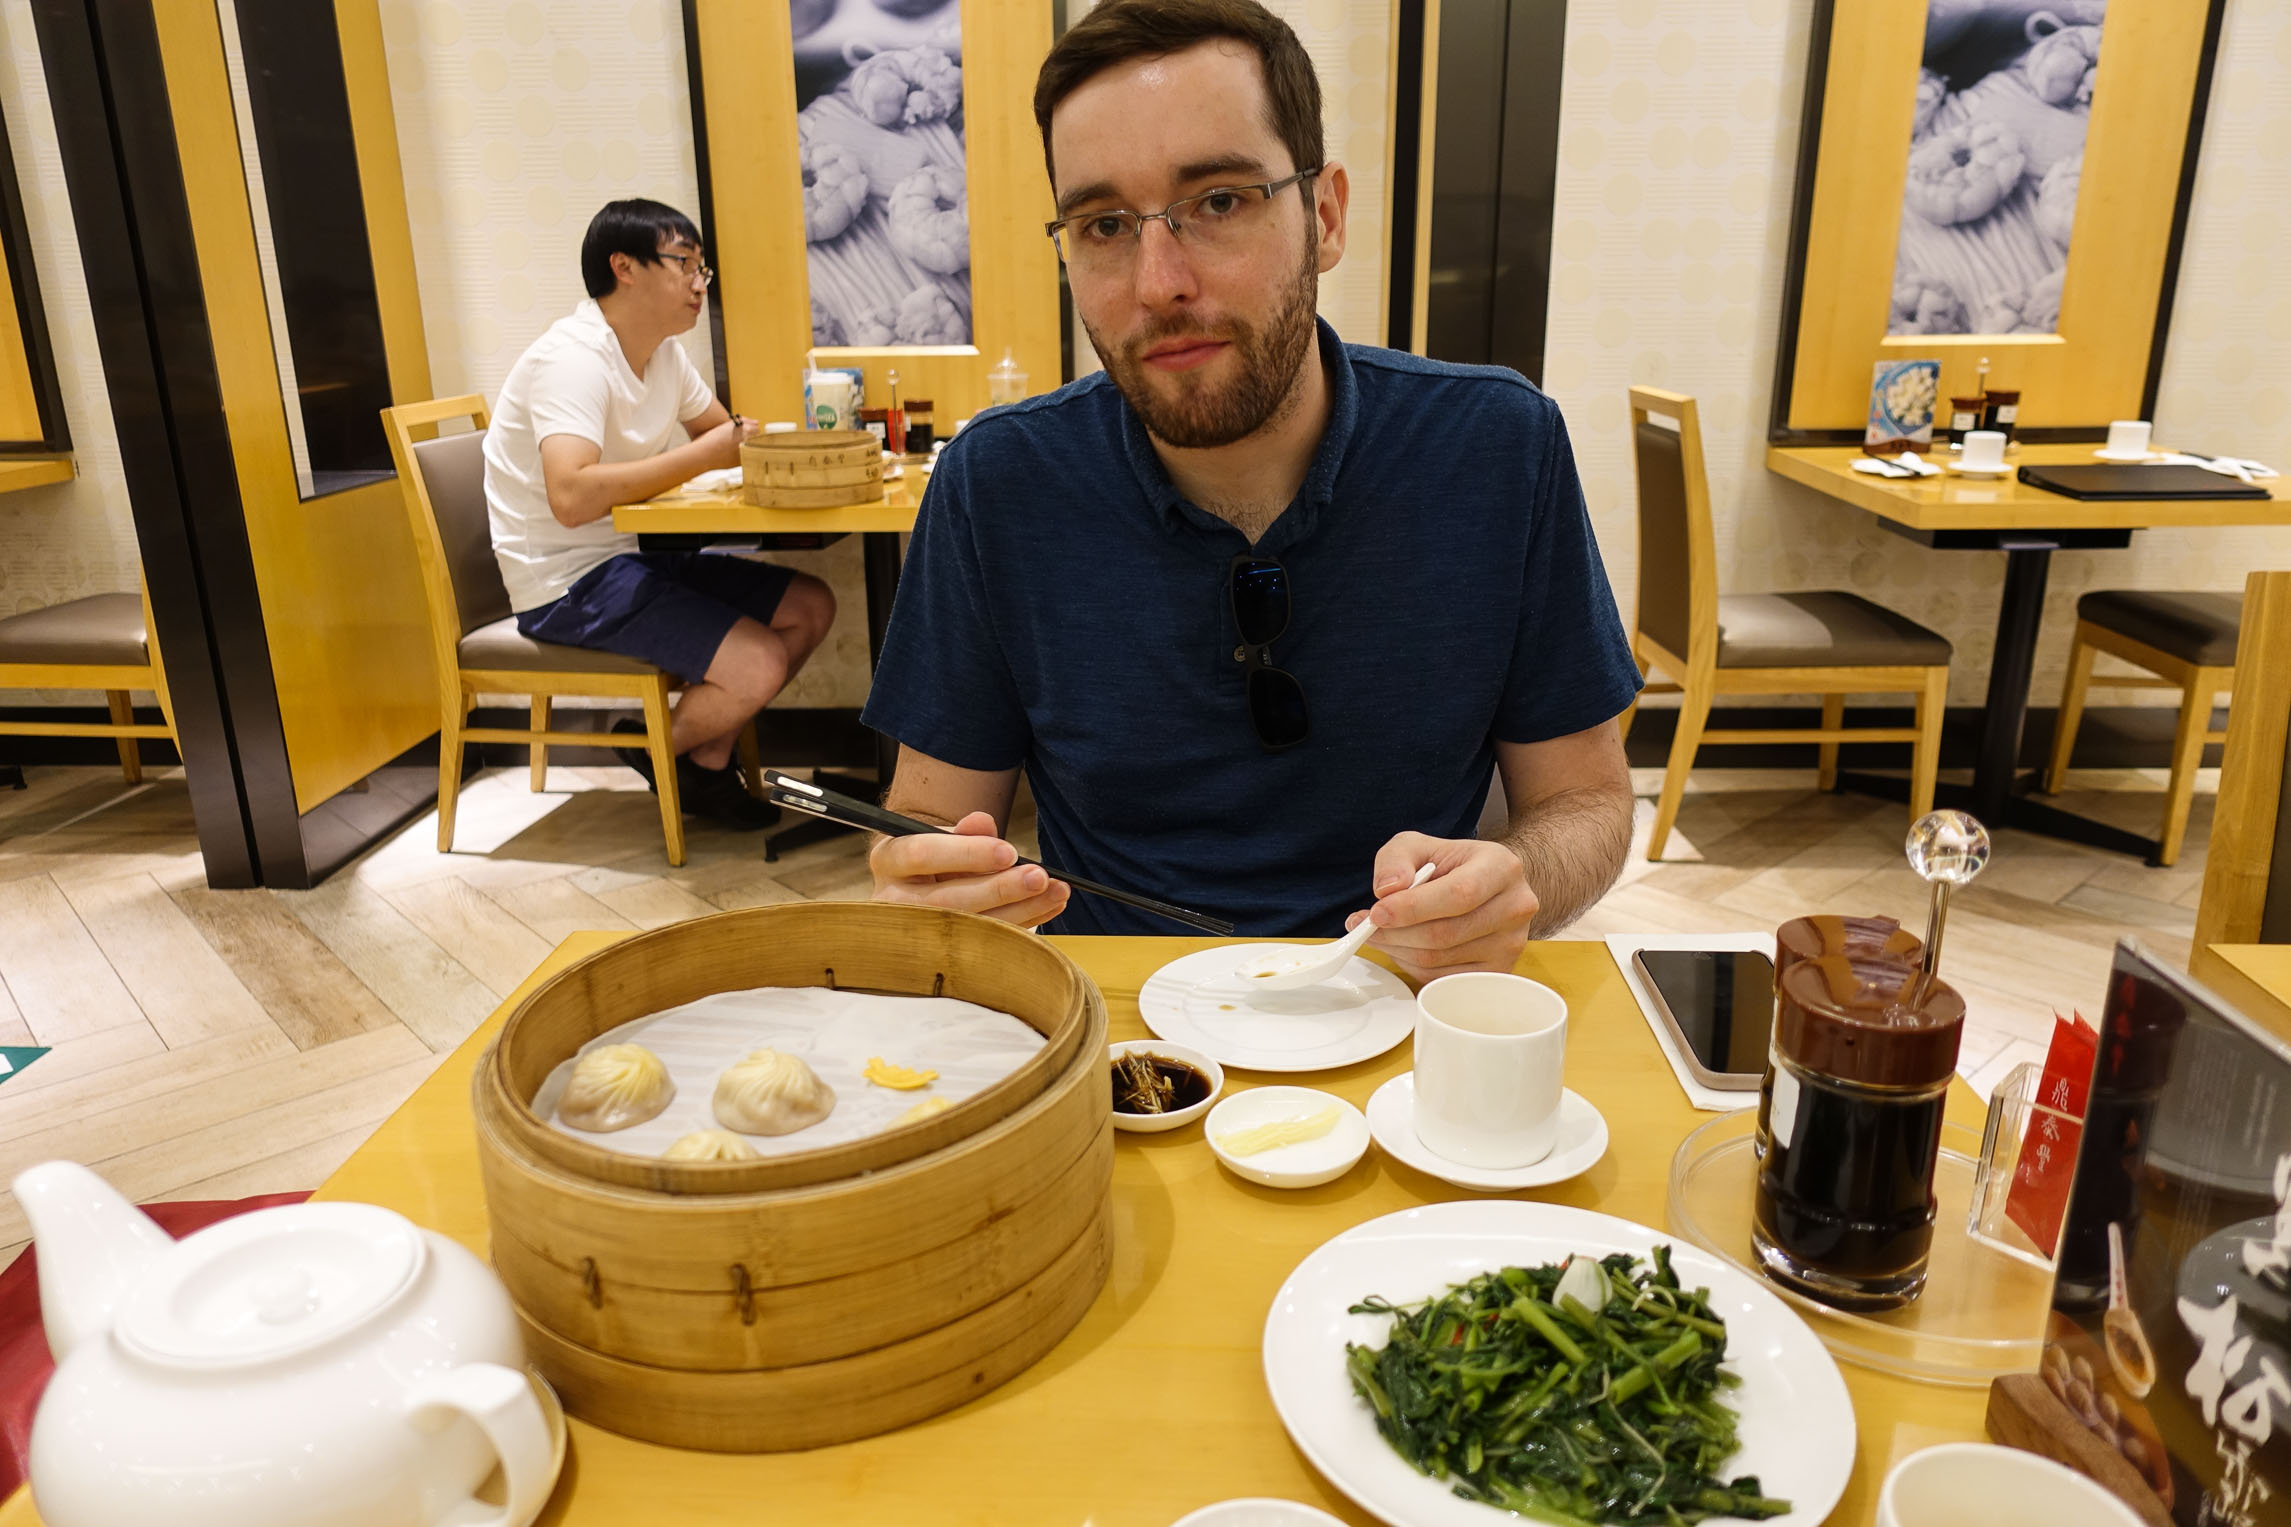 Akos and dumplings